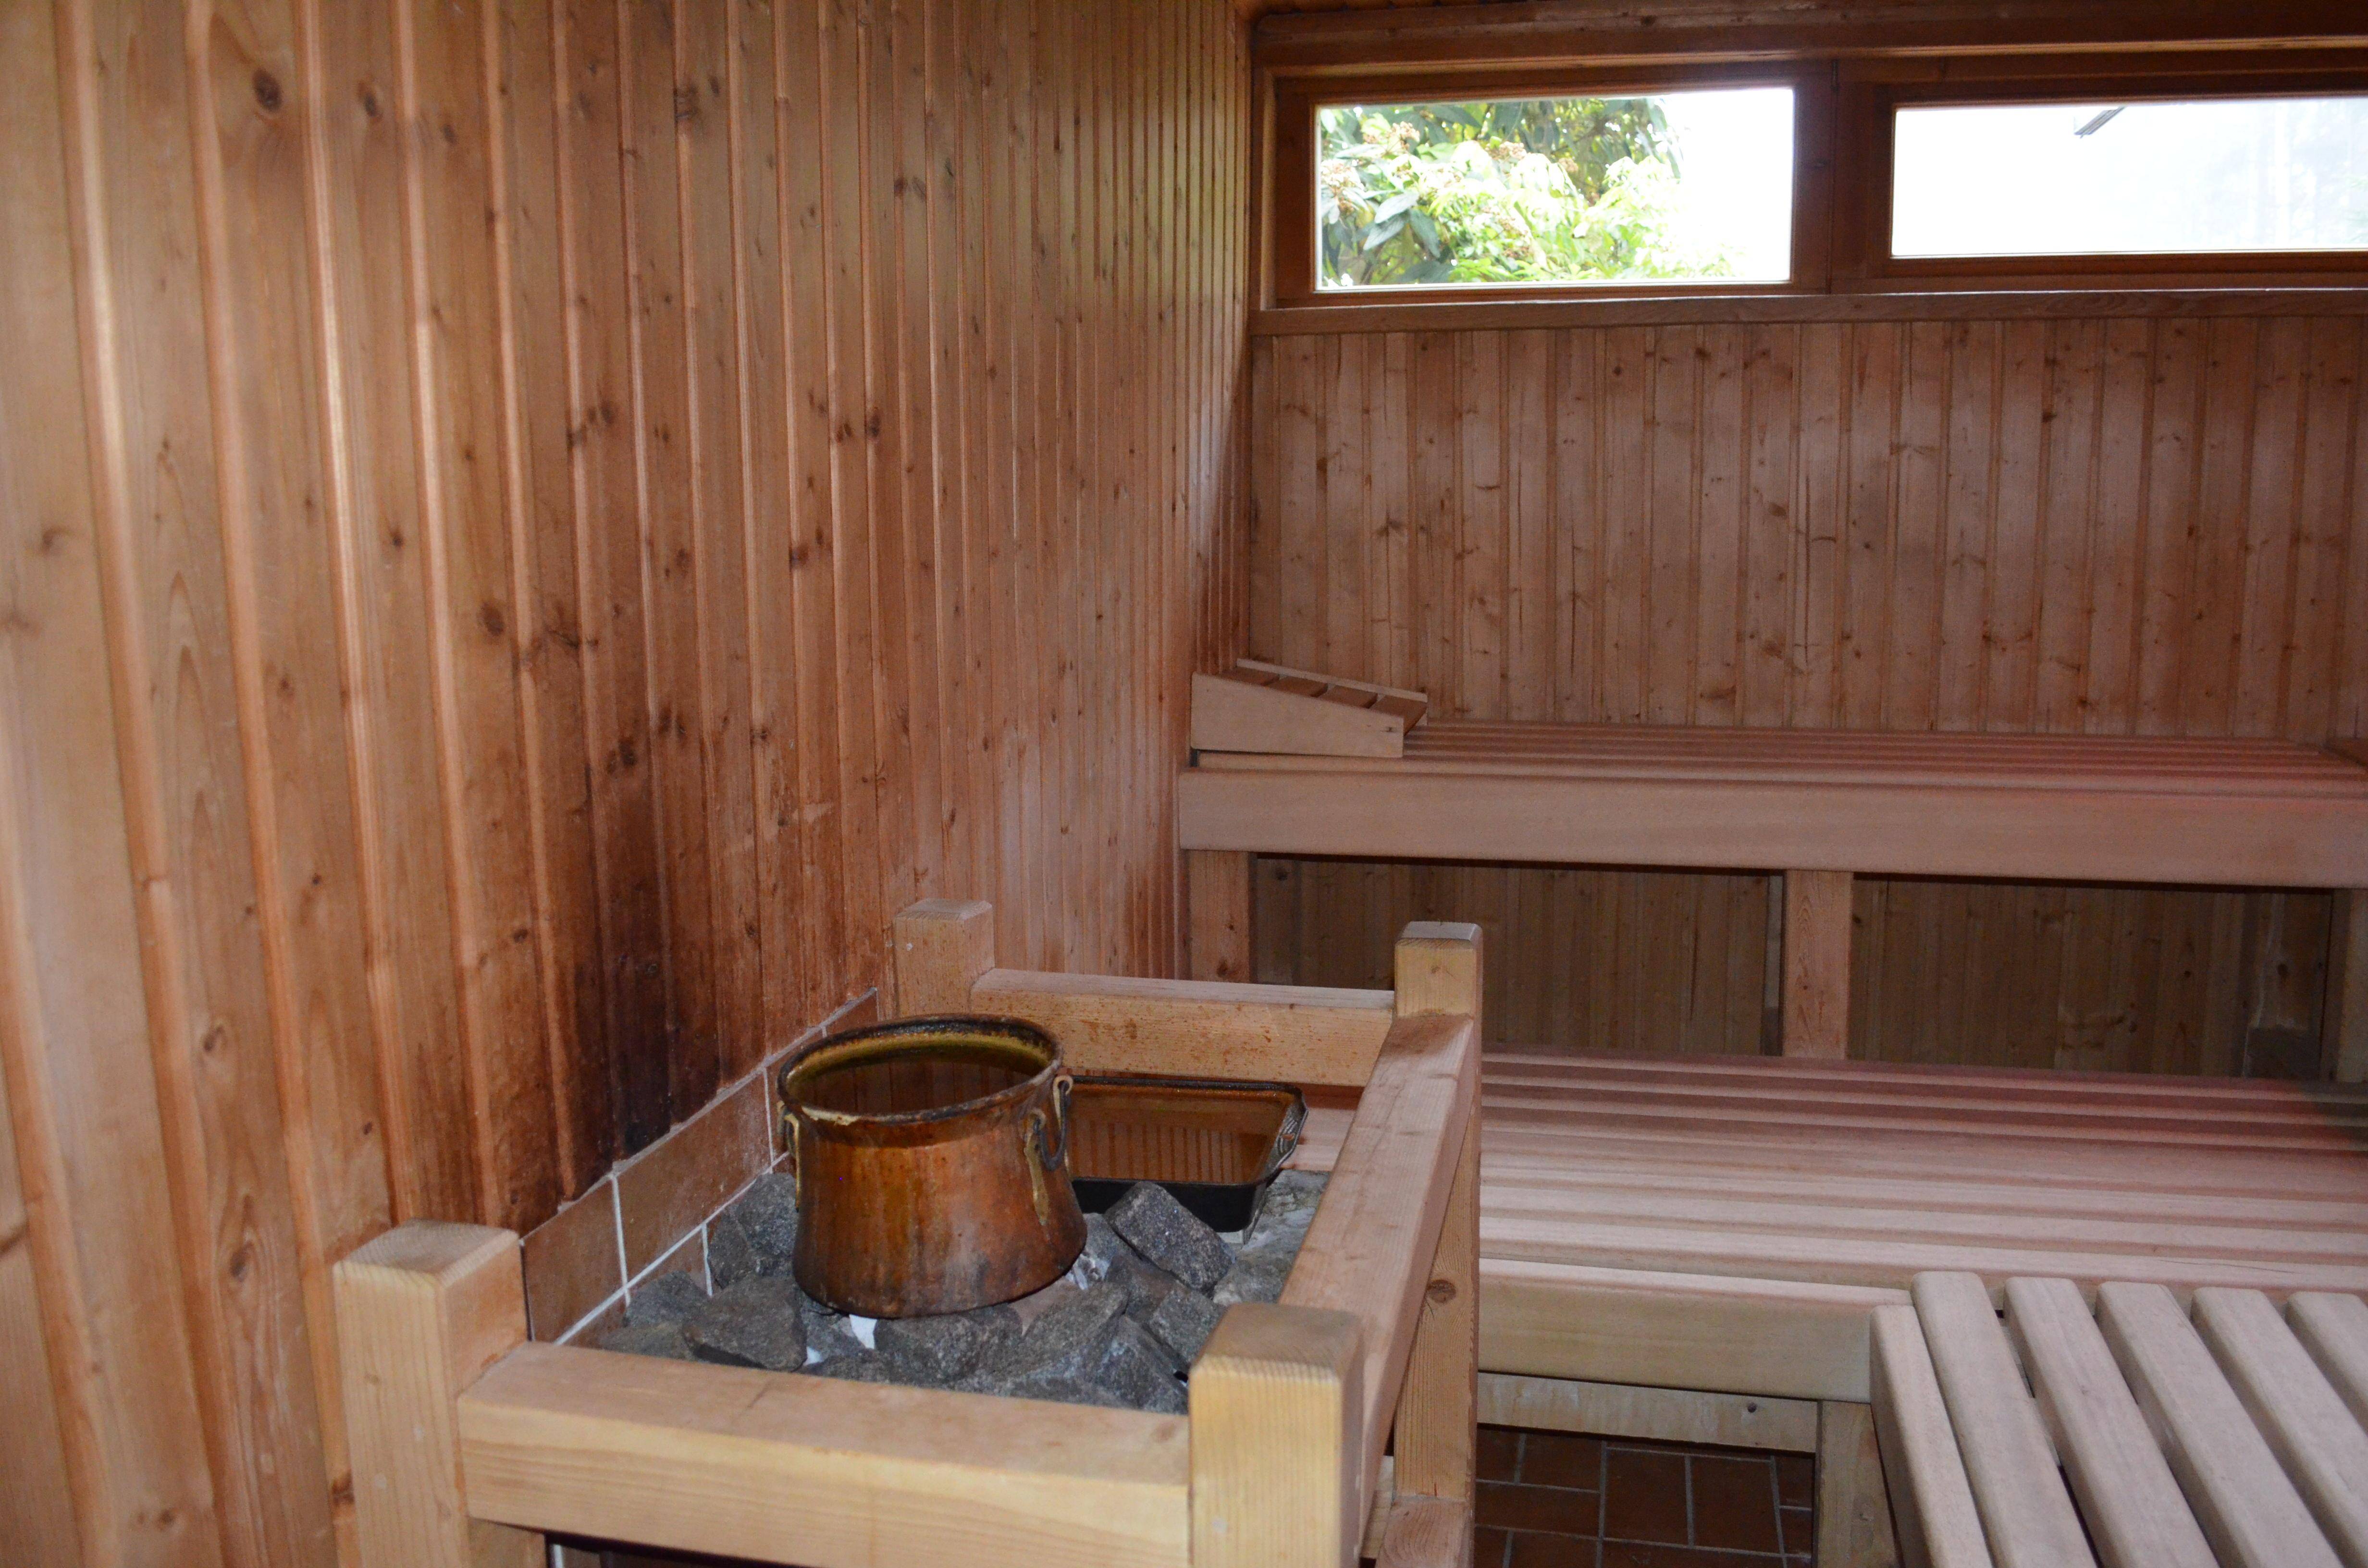 sauna+010.JPG